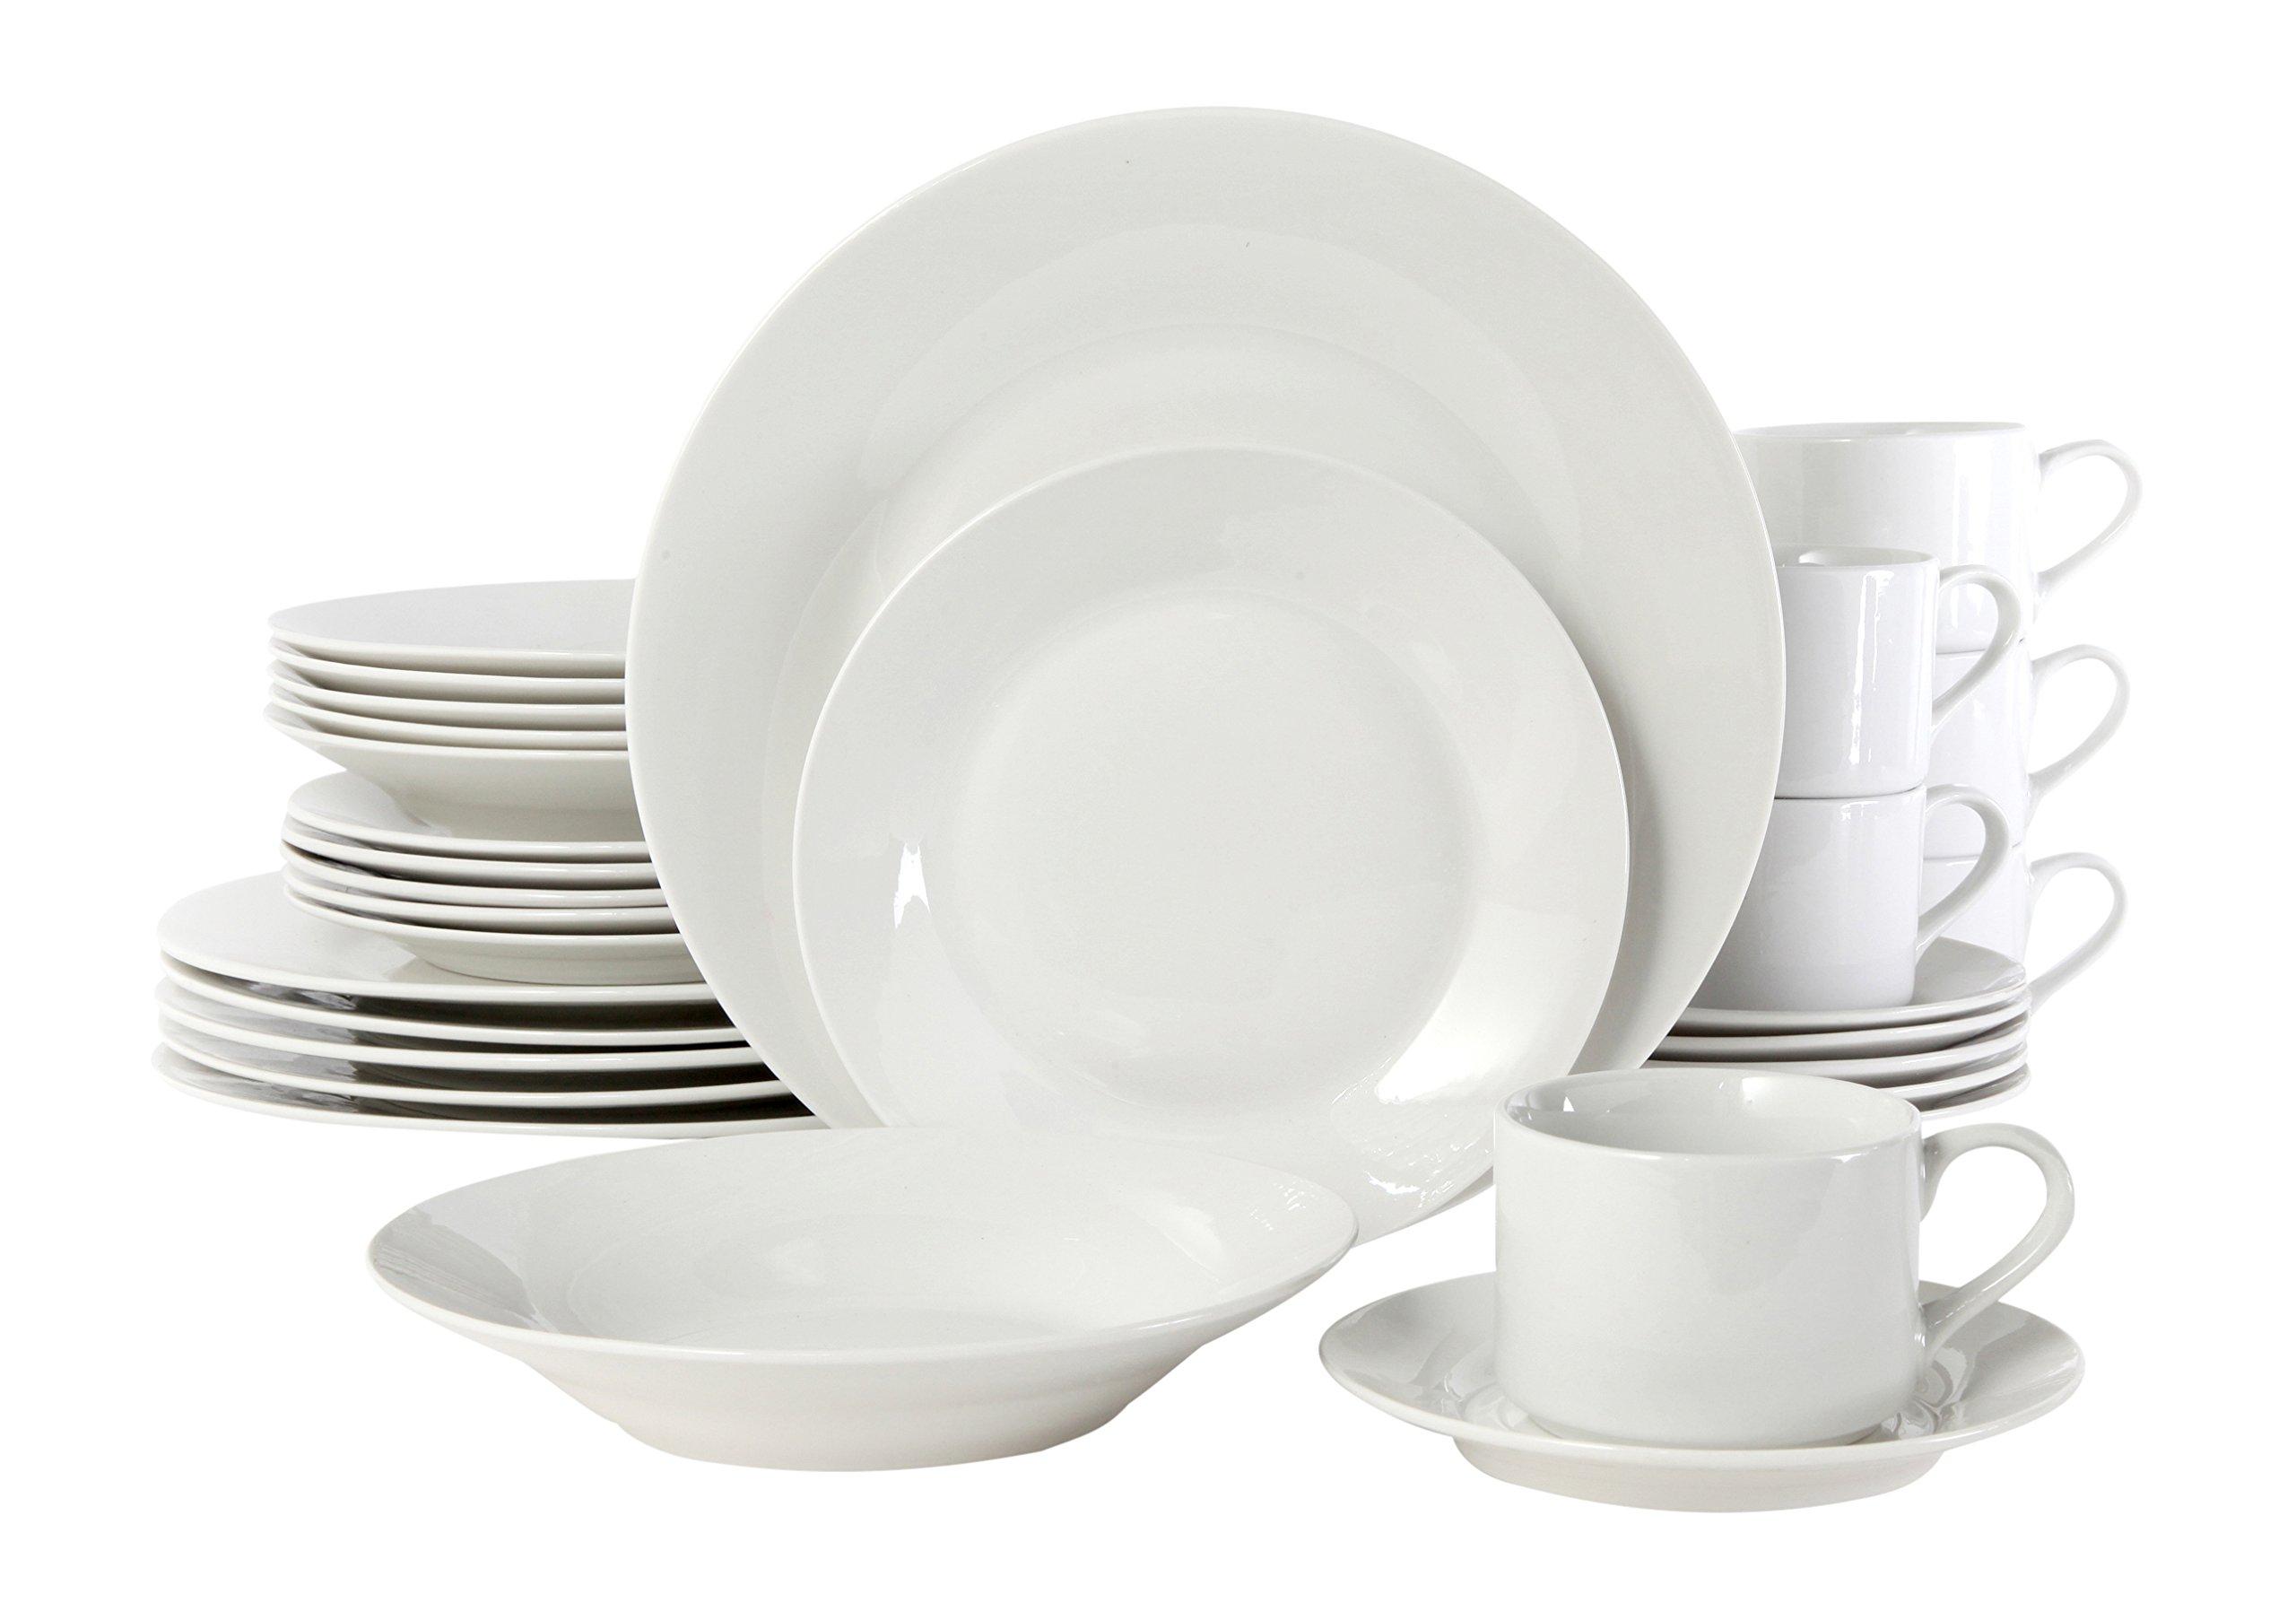 Gibson Home 100086.30RM Rosendal 30 Piece Round Dinnerware Set, White